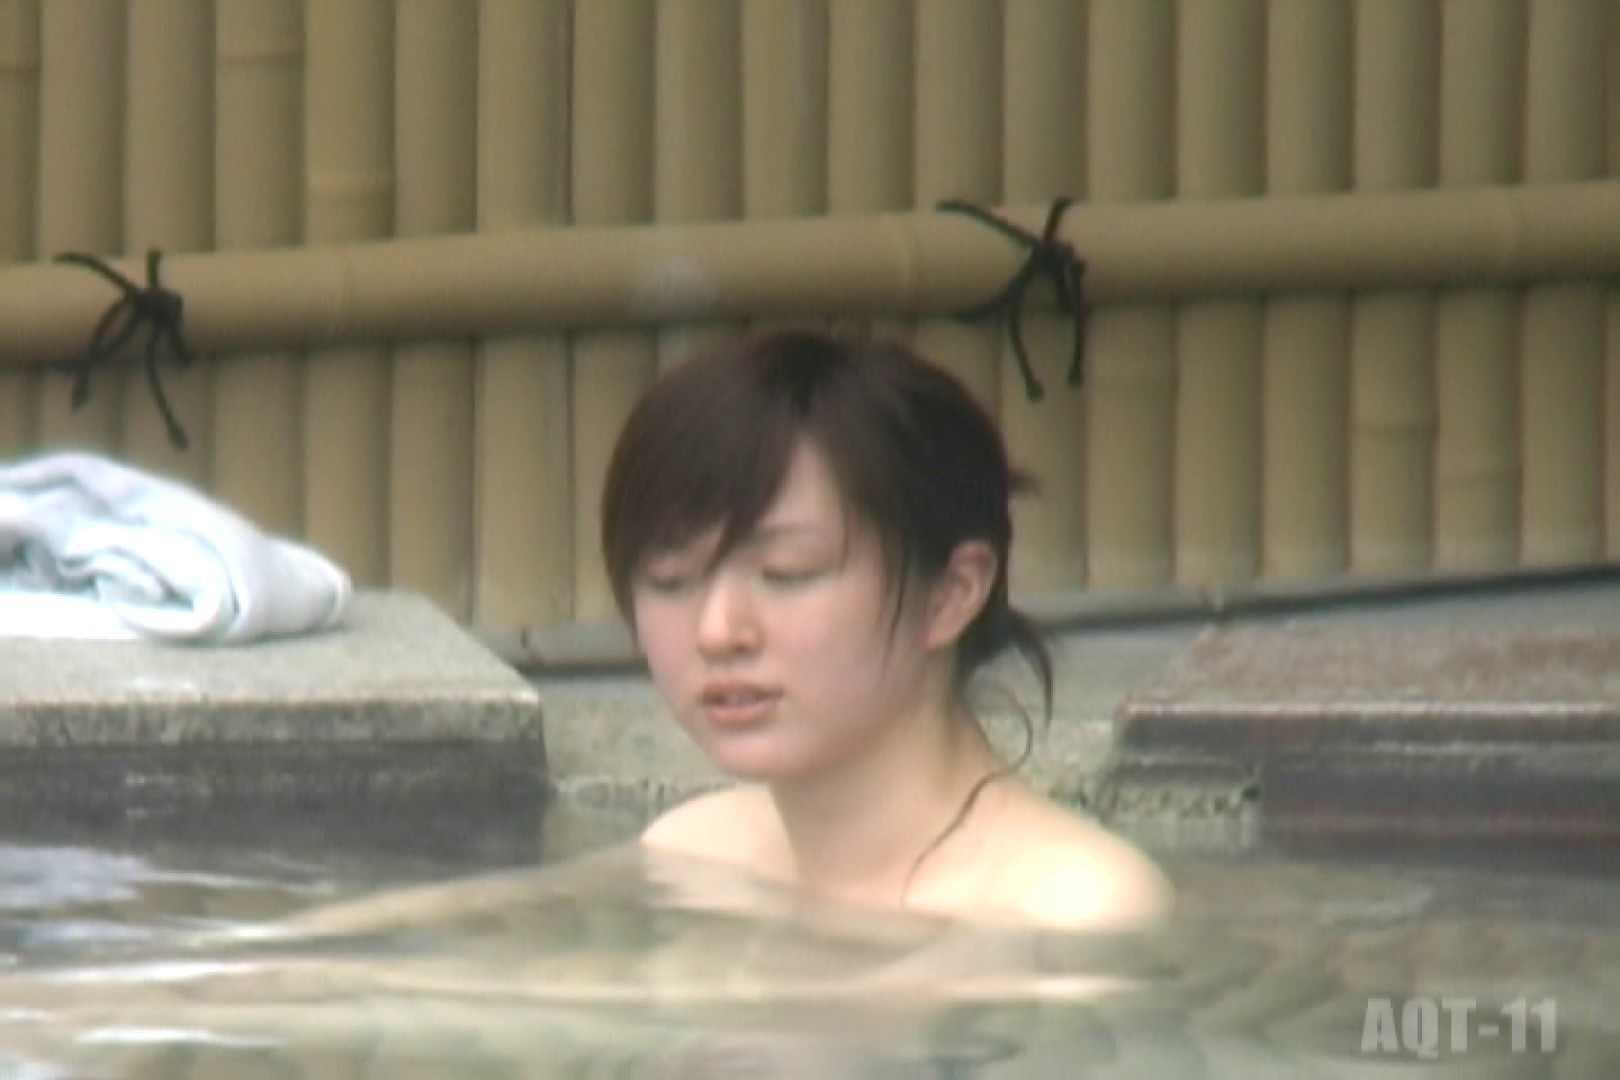 Aquaな露天風呂Vol.798 OL女体  107連発 105